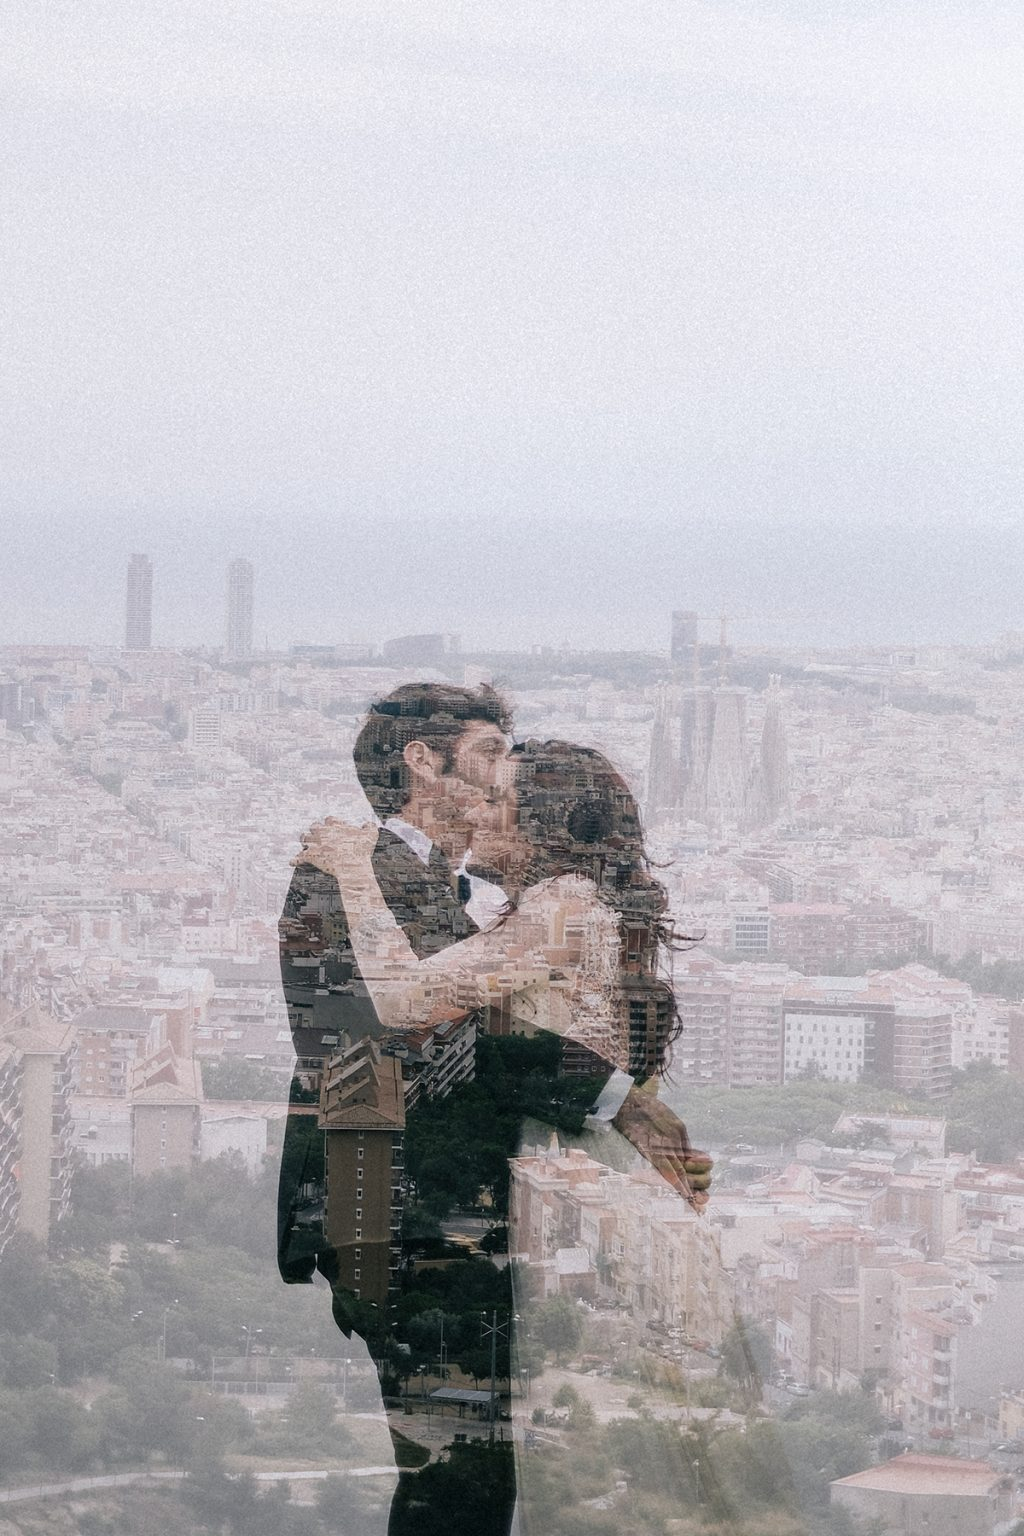 fotografo de bodas barcelona xavier baragona 7 - La Creativa Mirada de The Love and Roll